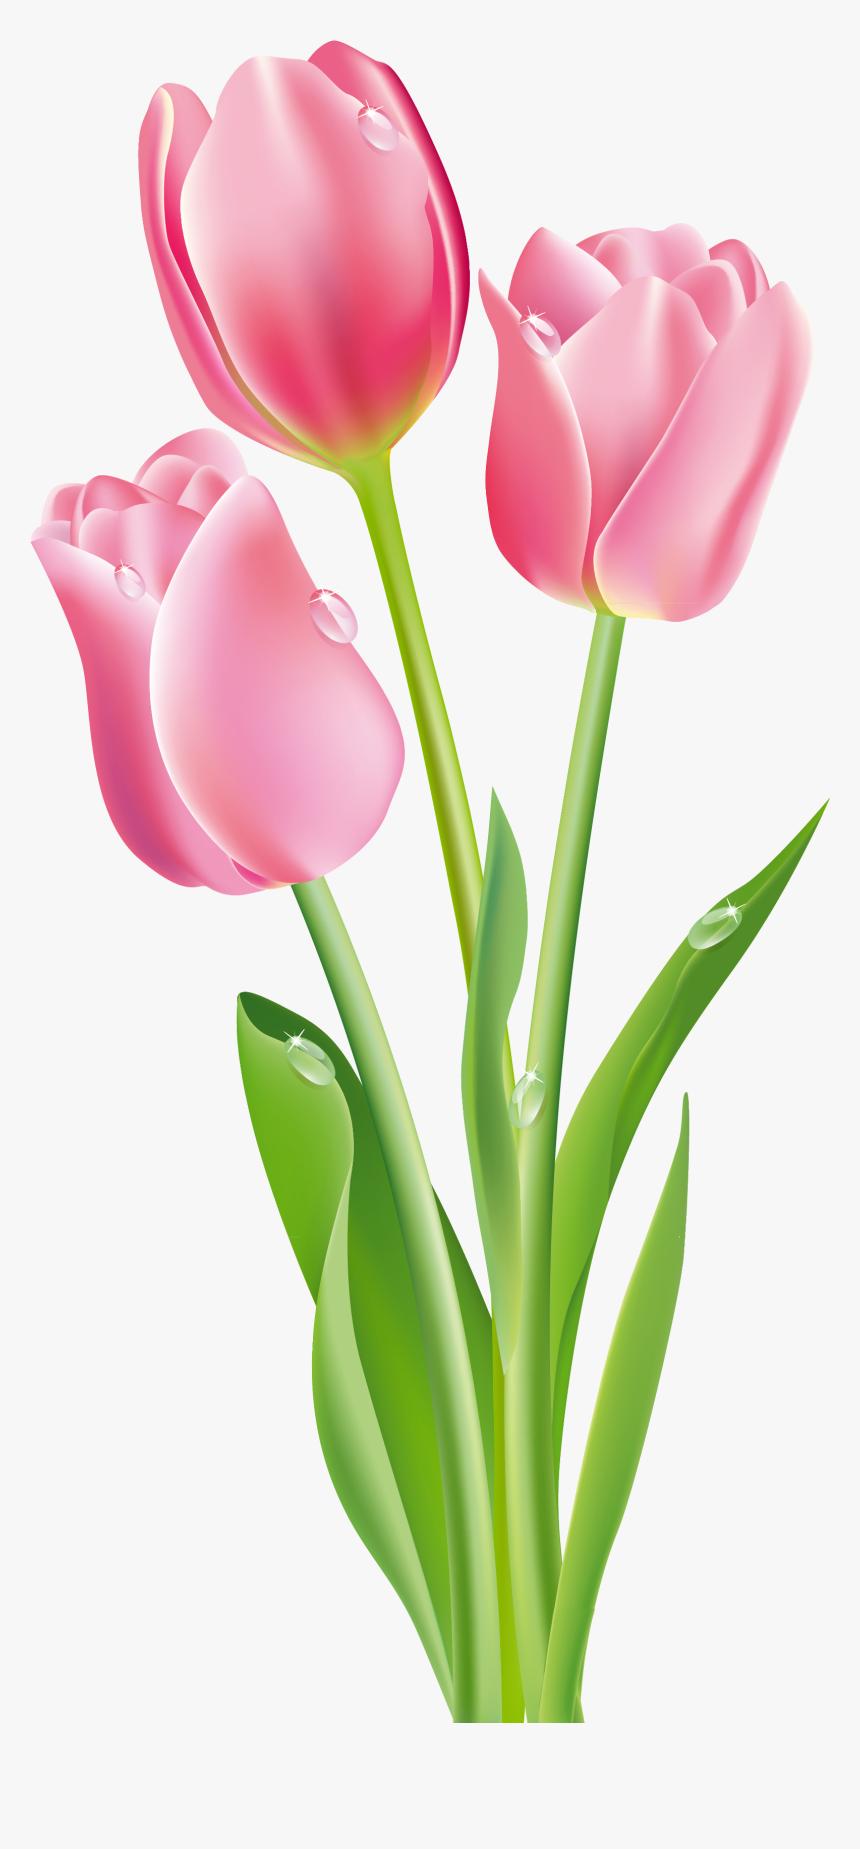 Tulip Flower Clipart Png, Transparent Png - kindpng (860 x 1849 Pixel)